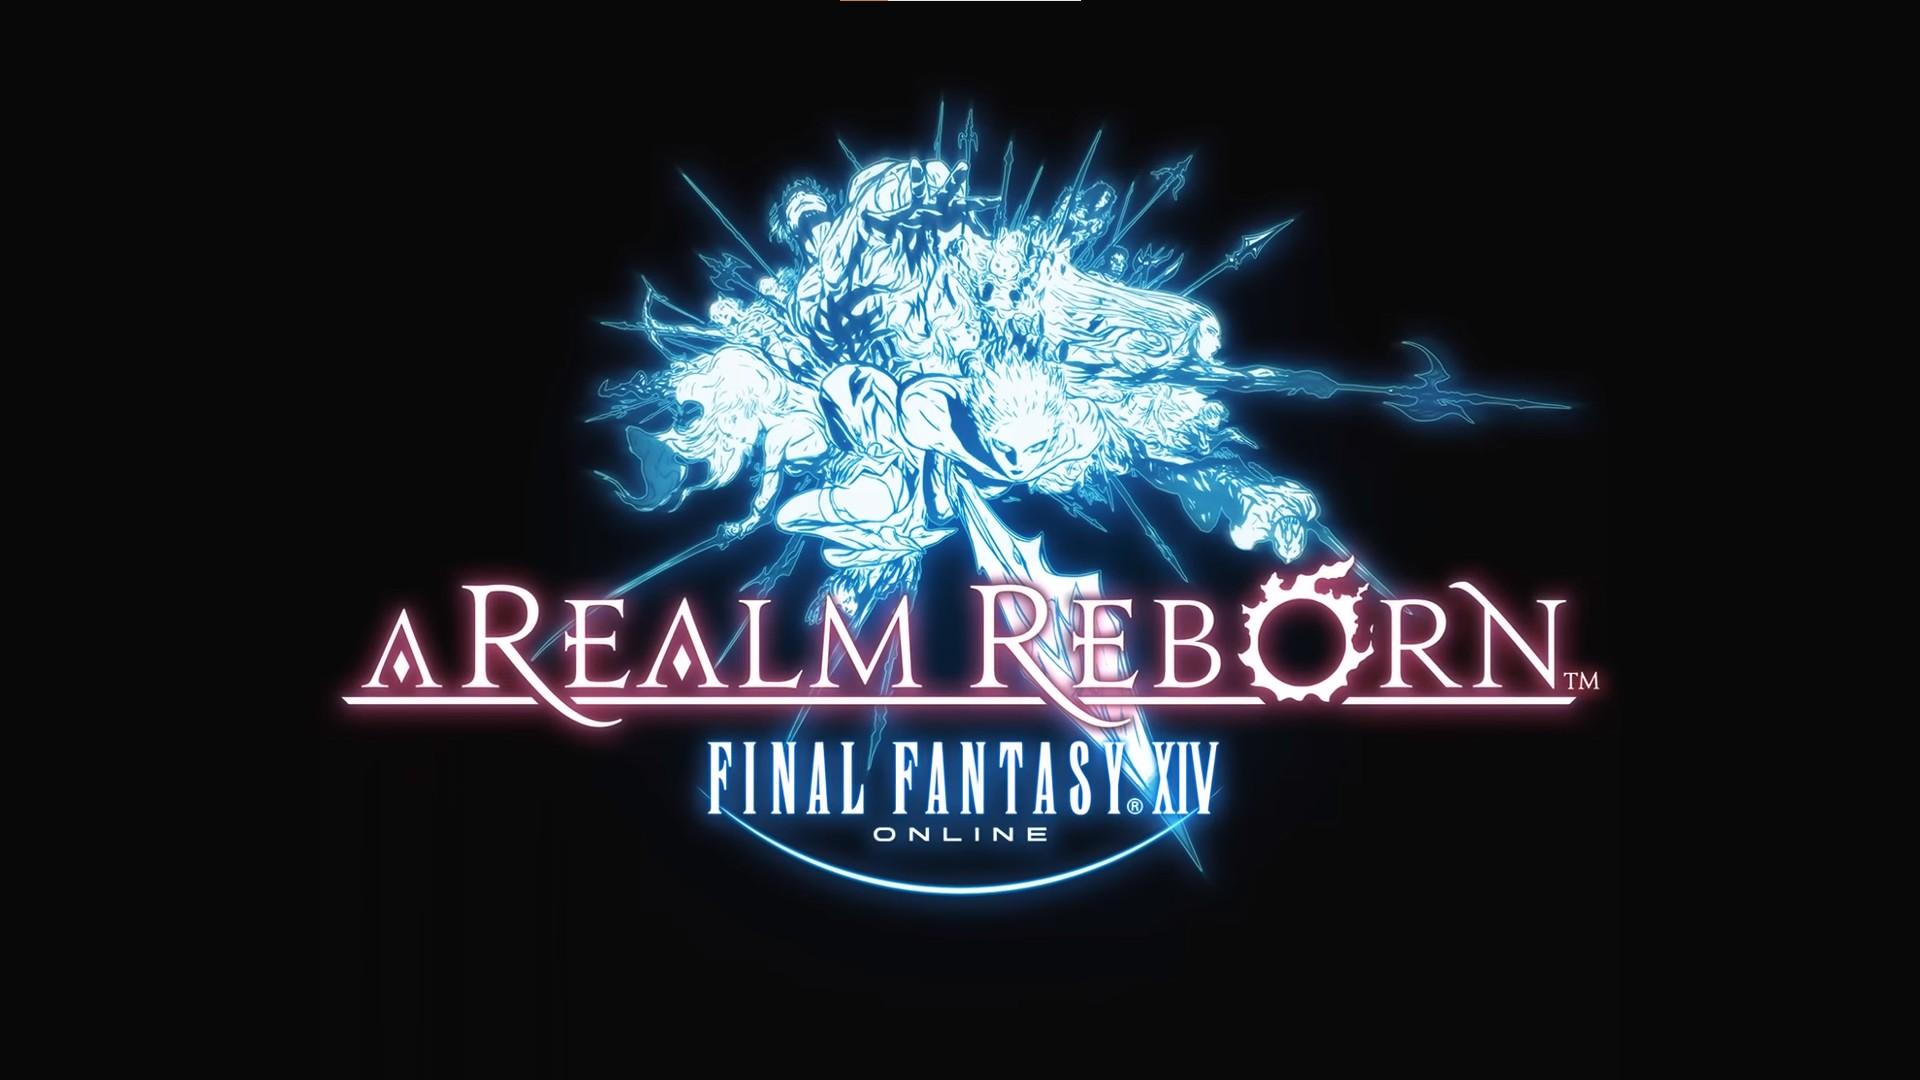 Final Fantasy XIV a realm reborn naoki yoshida wallpaper logo